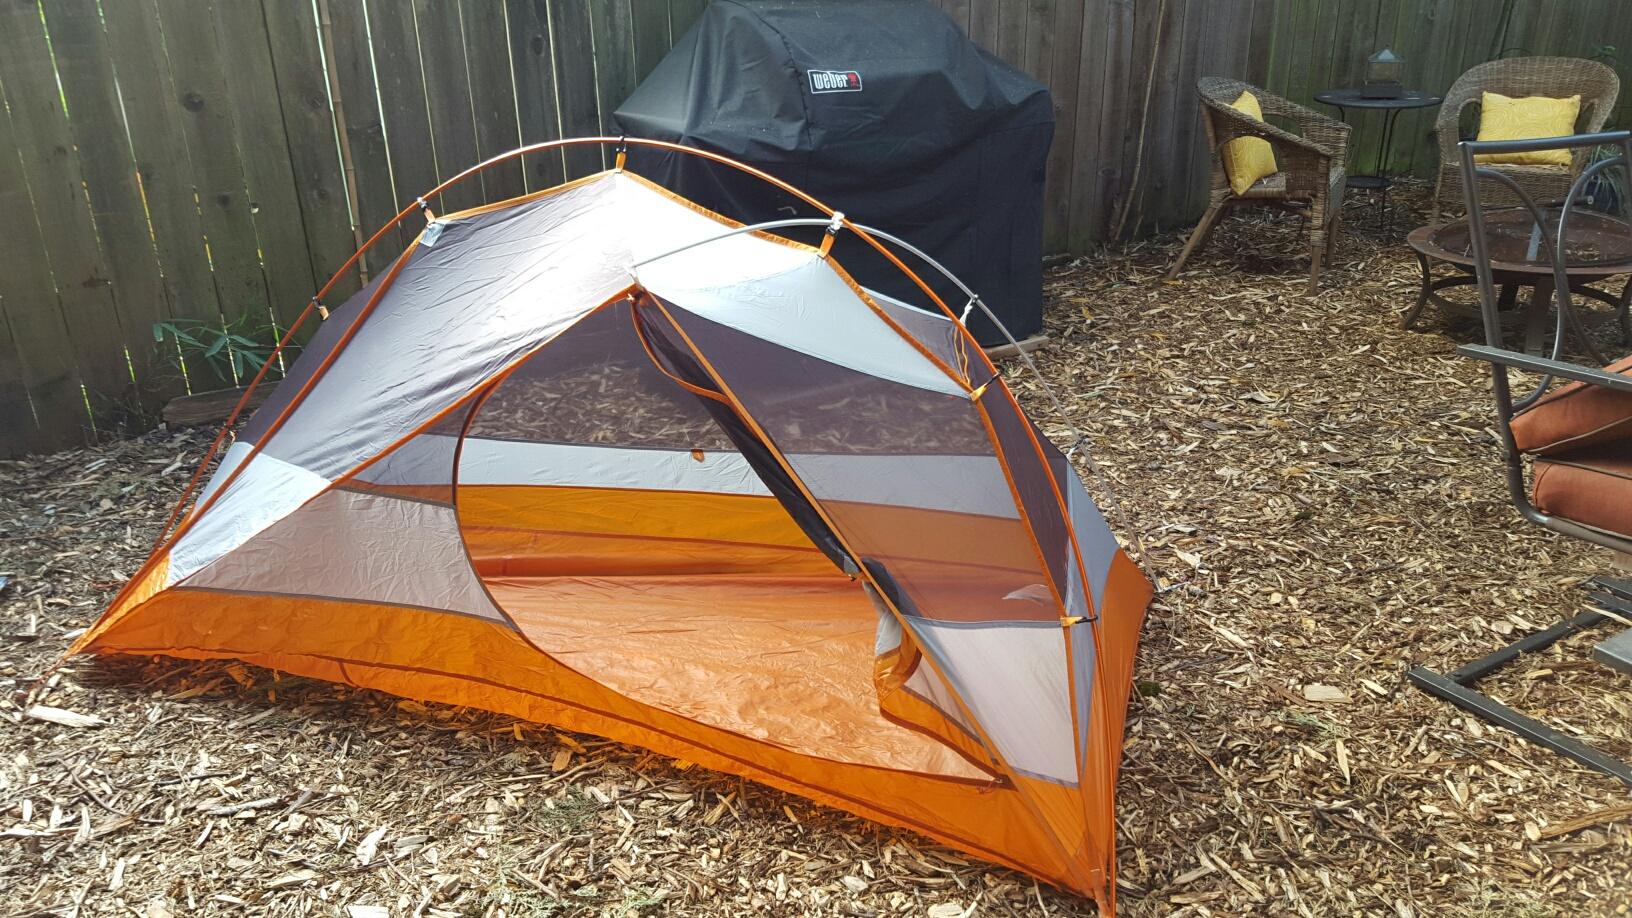 FS REI Quarter Dome 1P tent & FS: REI Quarter Dome 1P tent - Backpacking Light